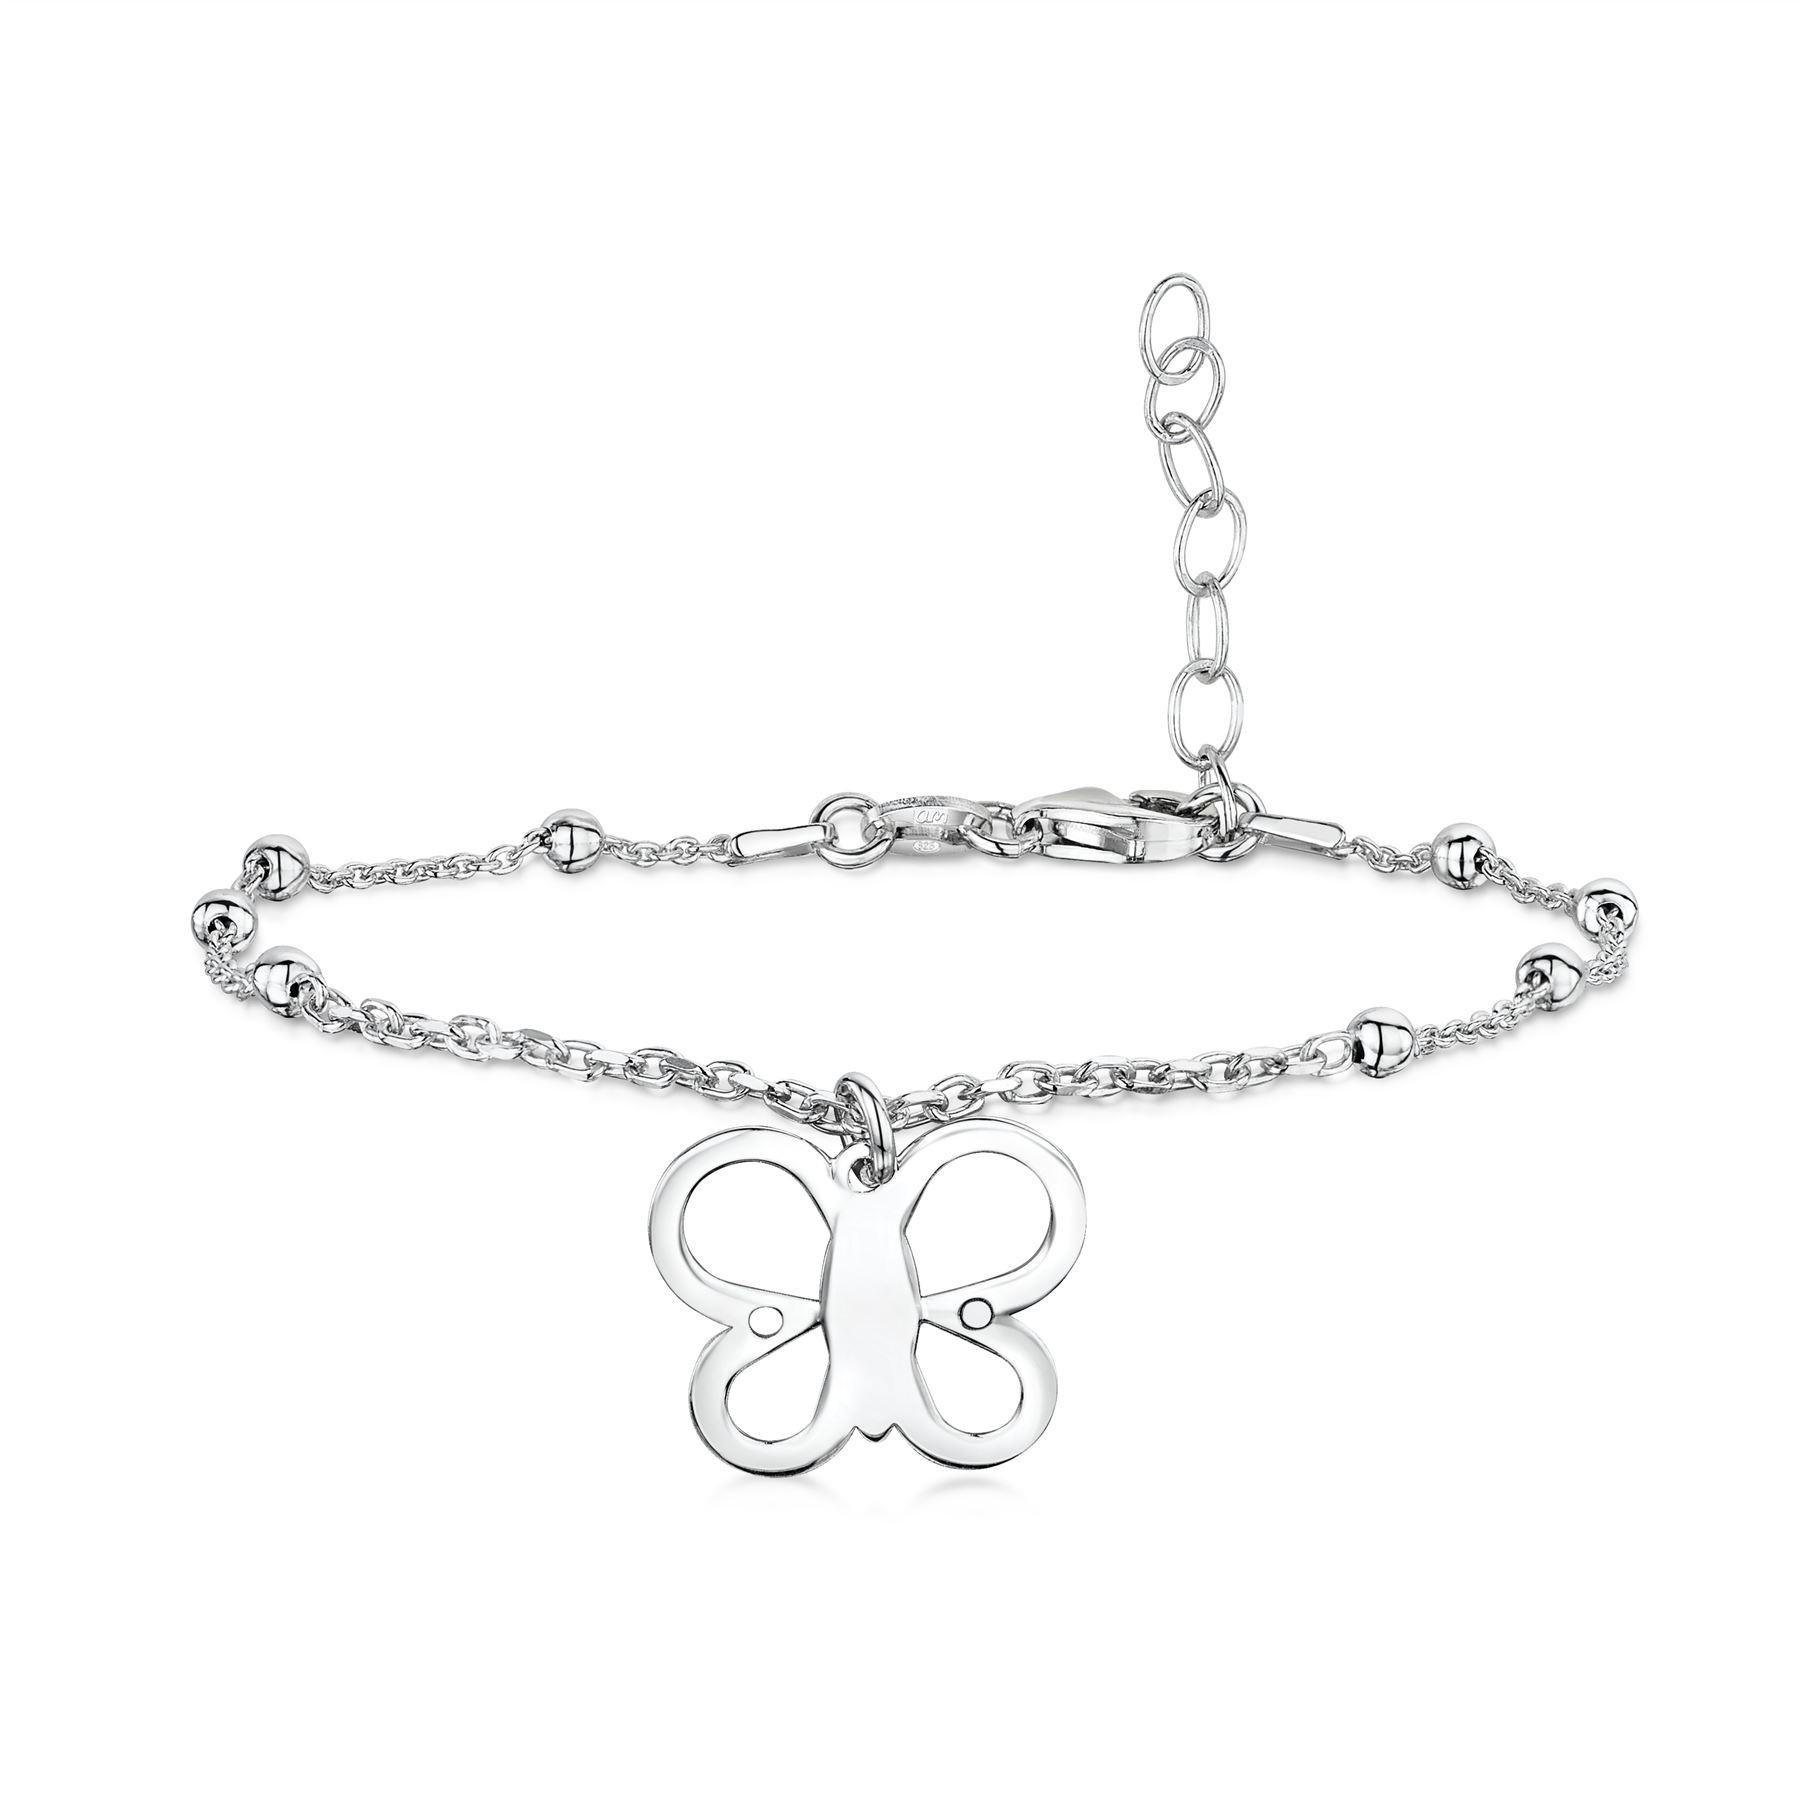 Amberta-Jewelry-925-Sterling-Silver-Adjustable-Bracelet-Italian-Bangle-for-Women thumbnail 48